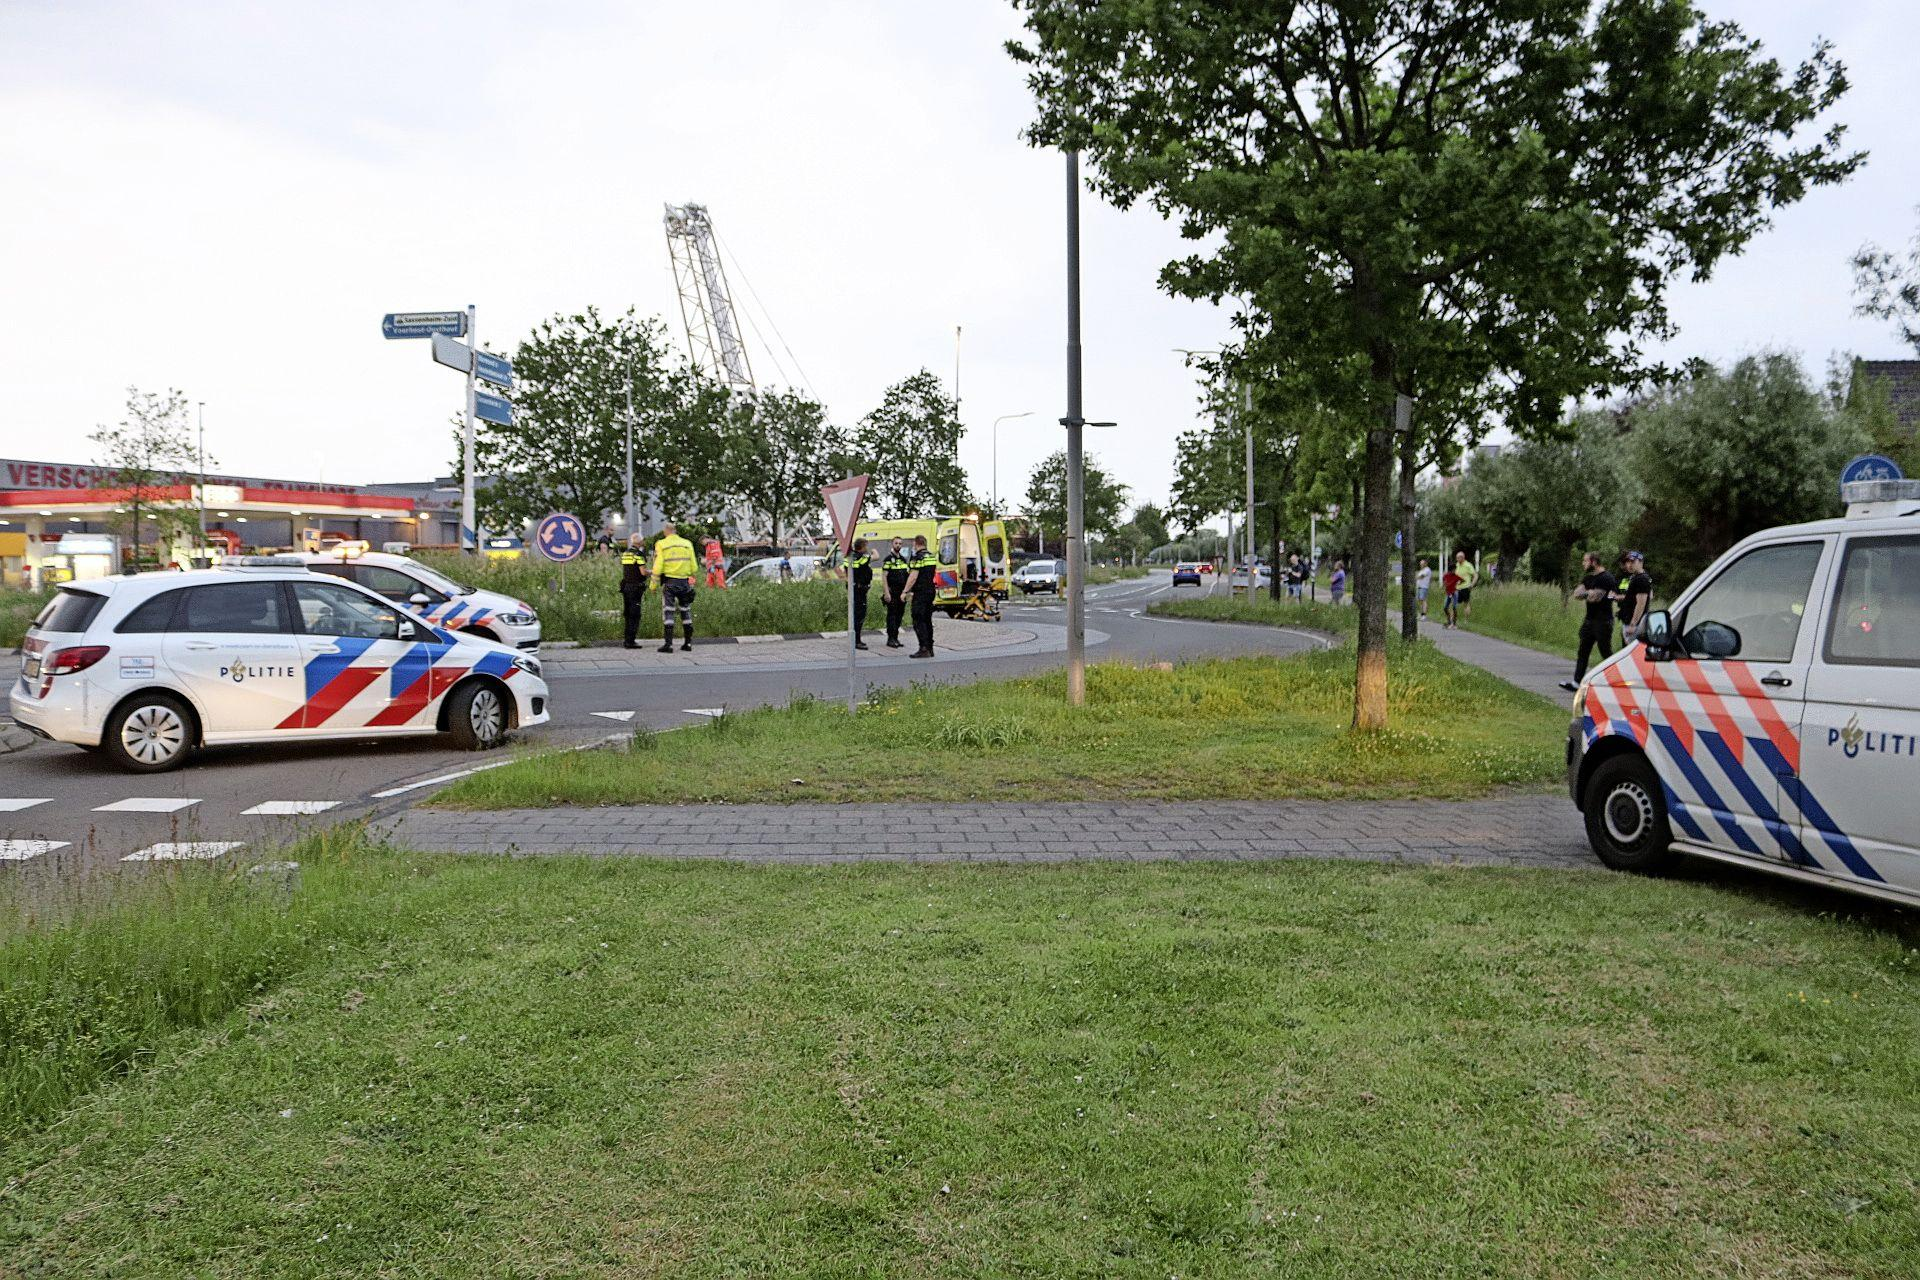 Motorrijder vliegt uit bocht op Rijksstraatweg in Sassenheim, slachtoffer overleden